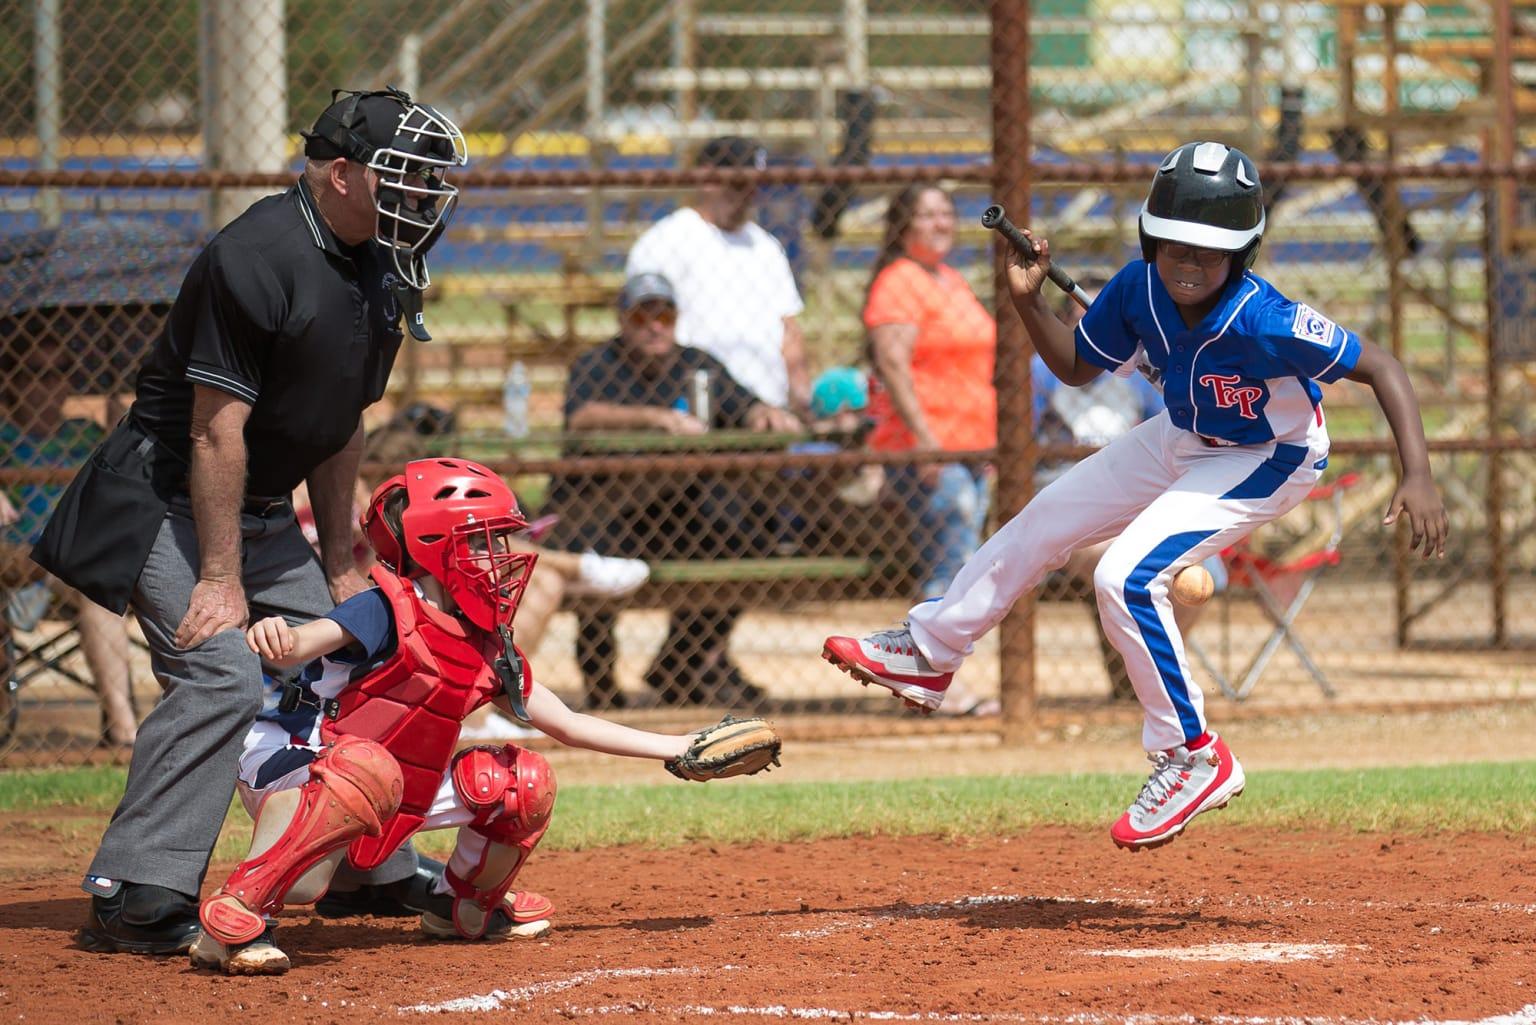 San Diego Softball Leagues